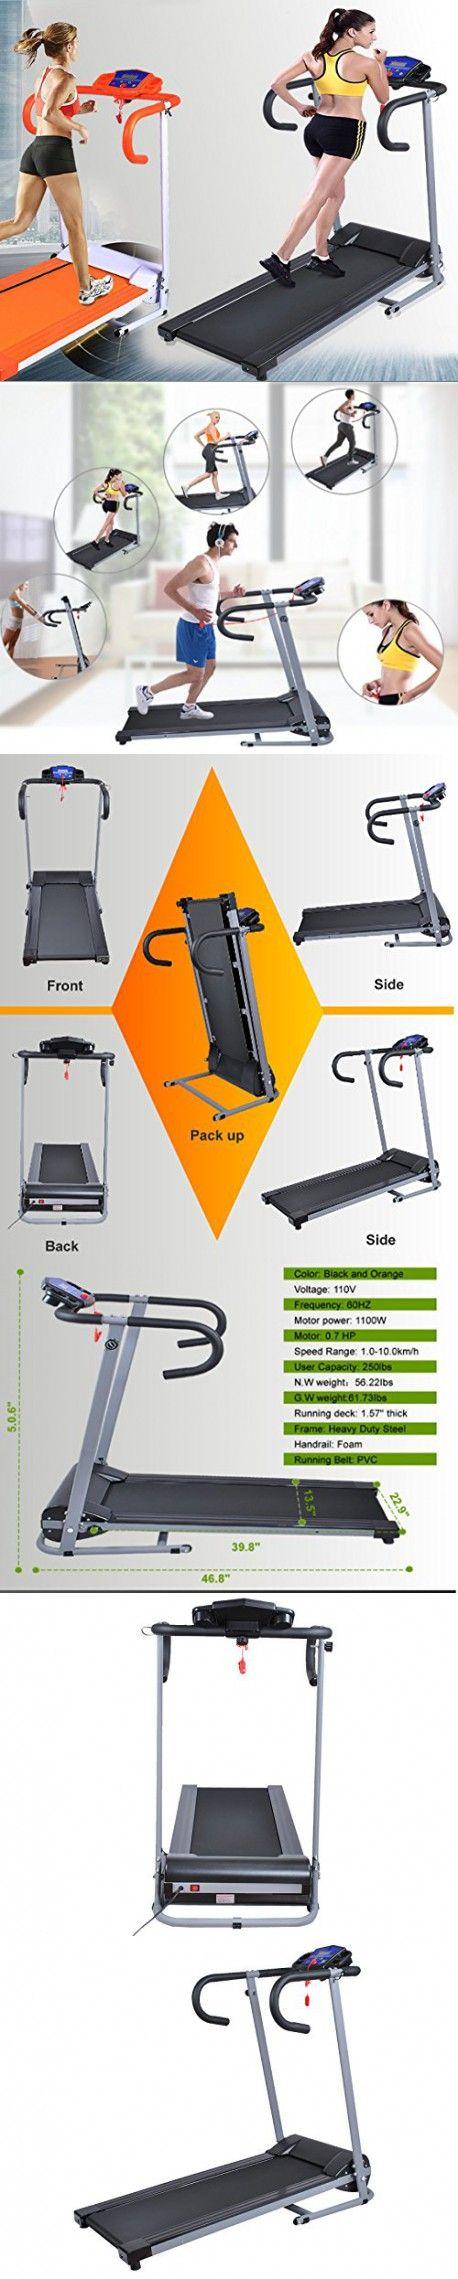 Gracelove 500W/1100W Folding Electric Treadmill Portable Motorized Running Machine Black (1000W Black(Folding))